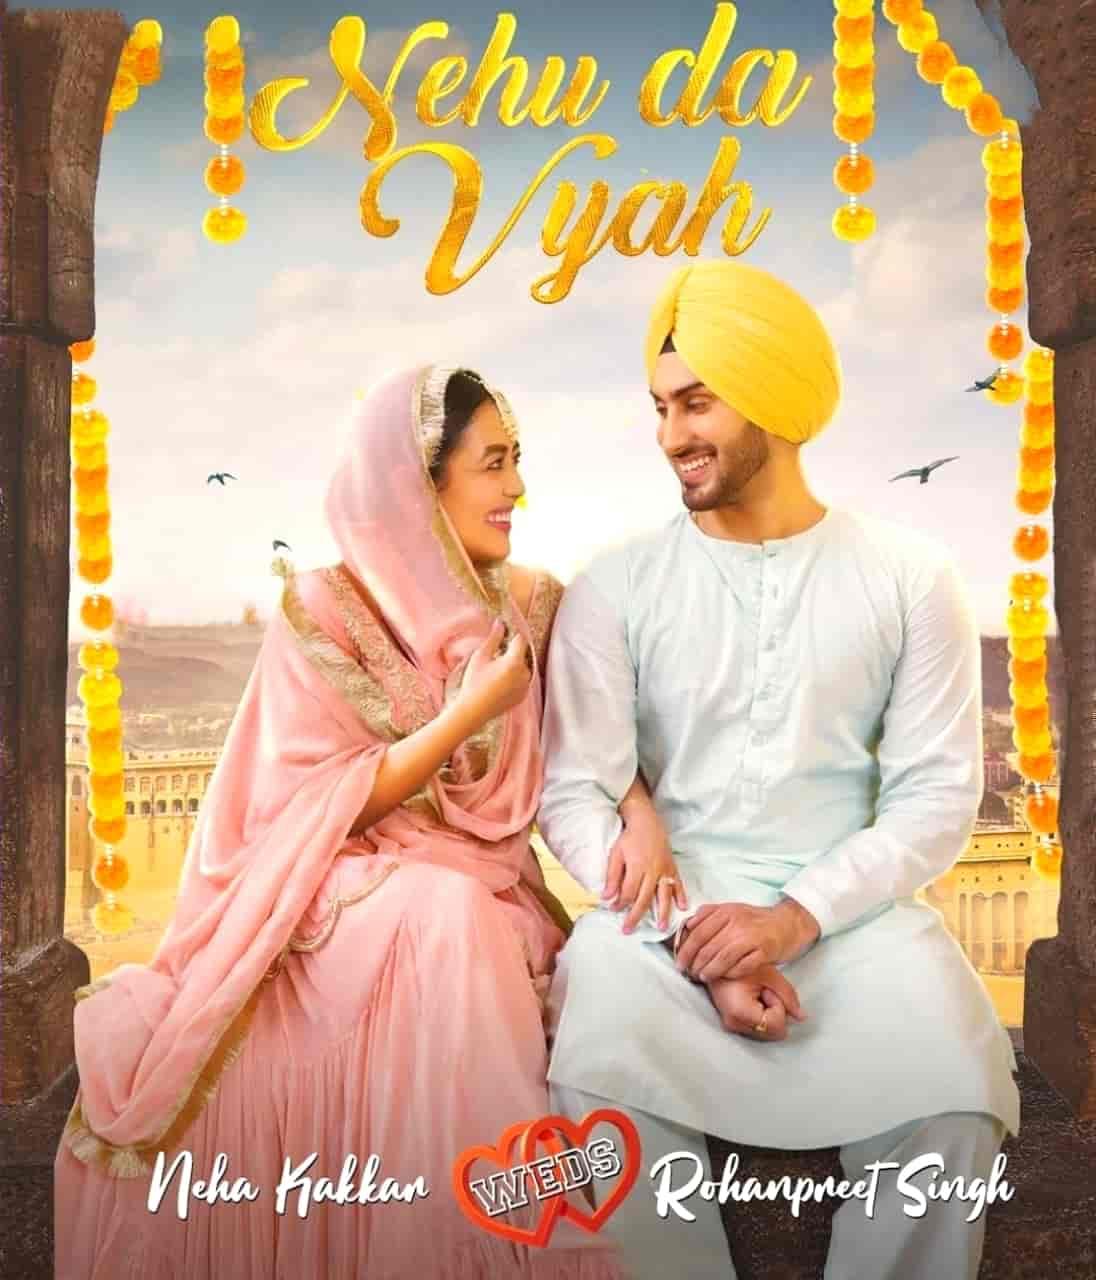 Nehu Da Vyah Punjabi Song Image Features Neha Kakkar and Rohanpreet Singh